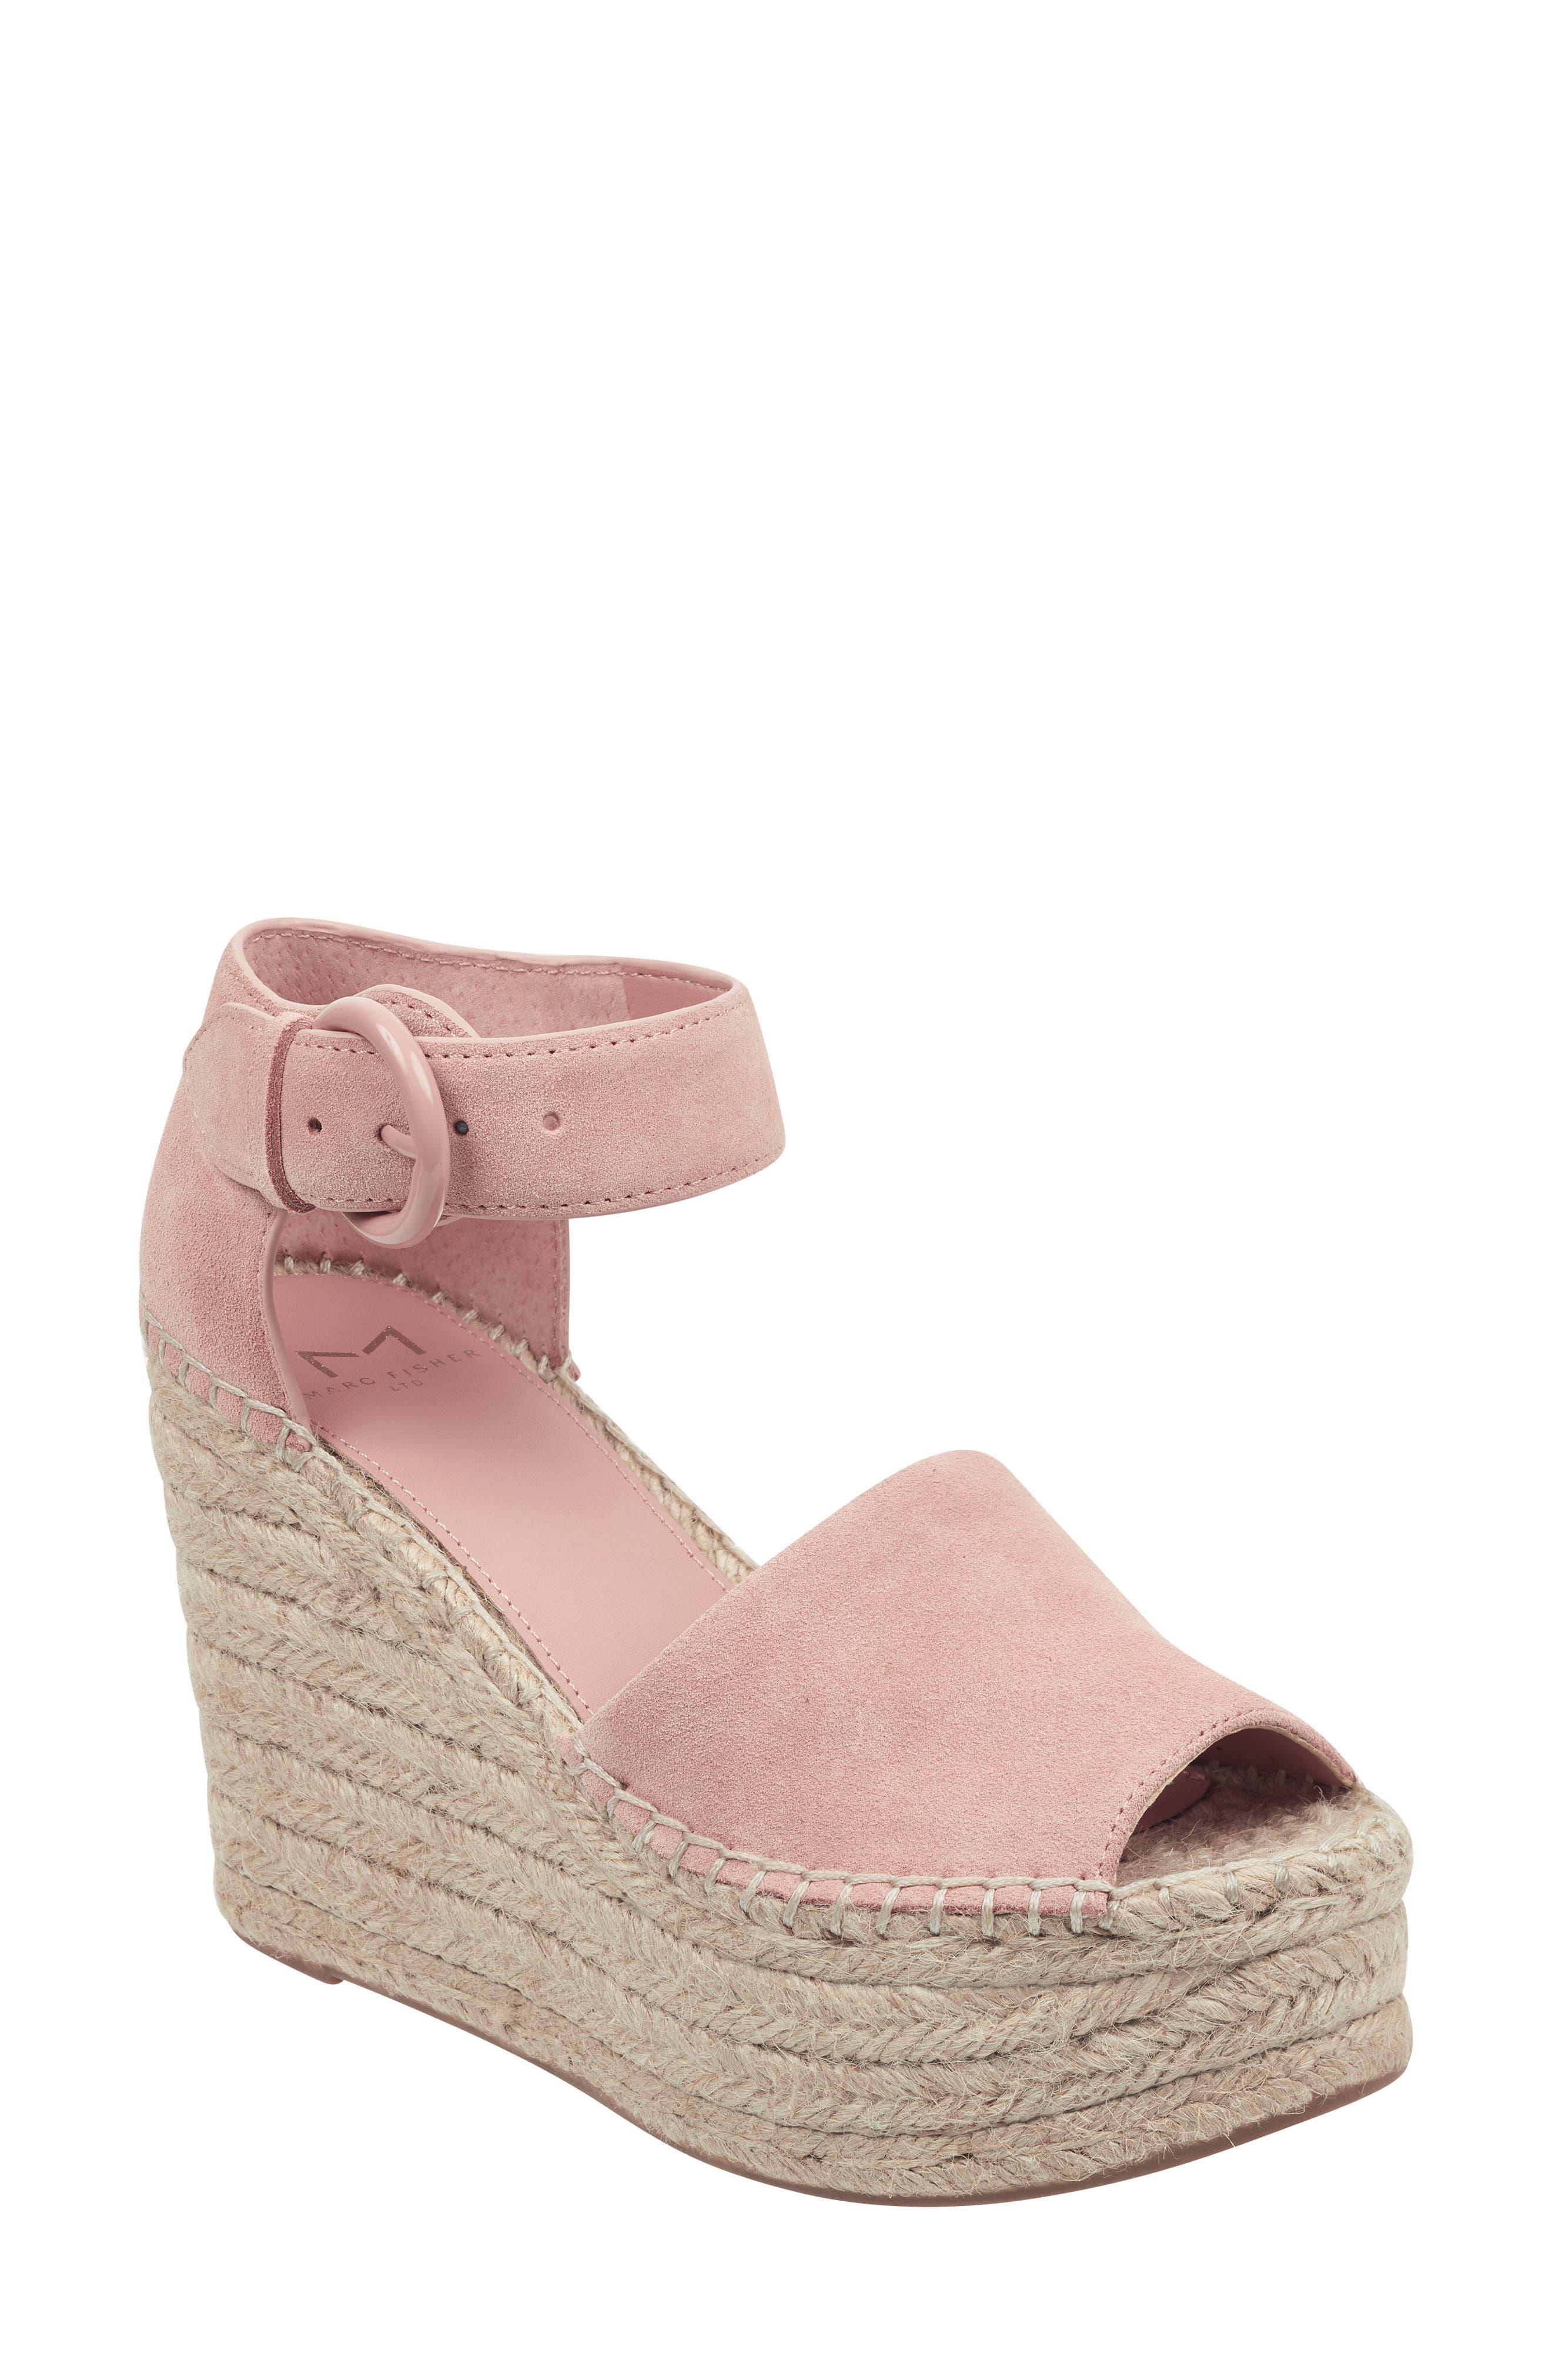 593d986223e Women s Marc Fisher LTD Wedge Sandals